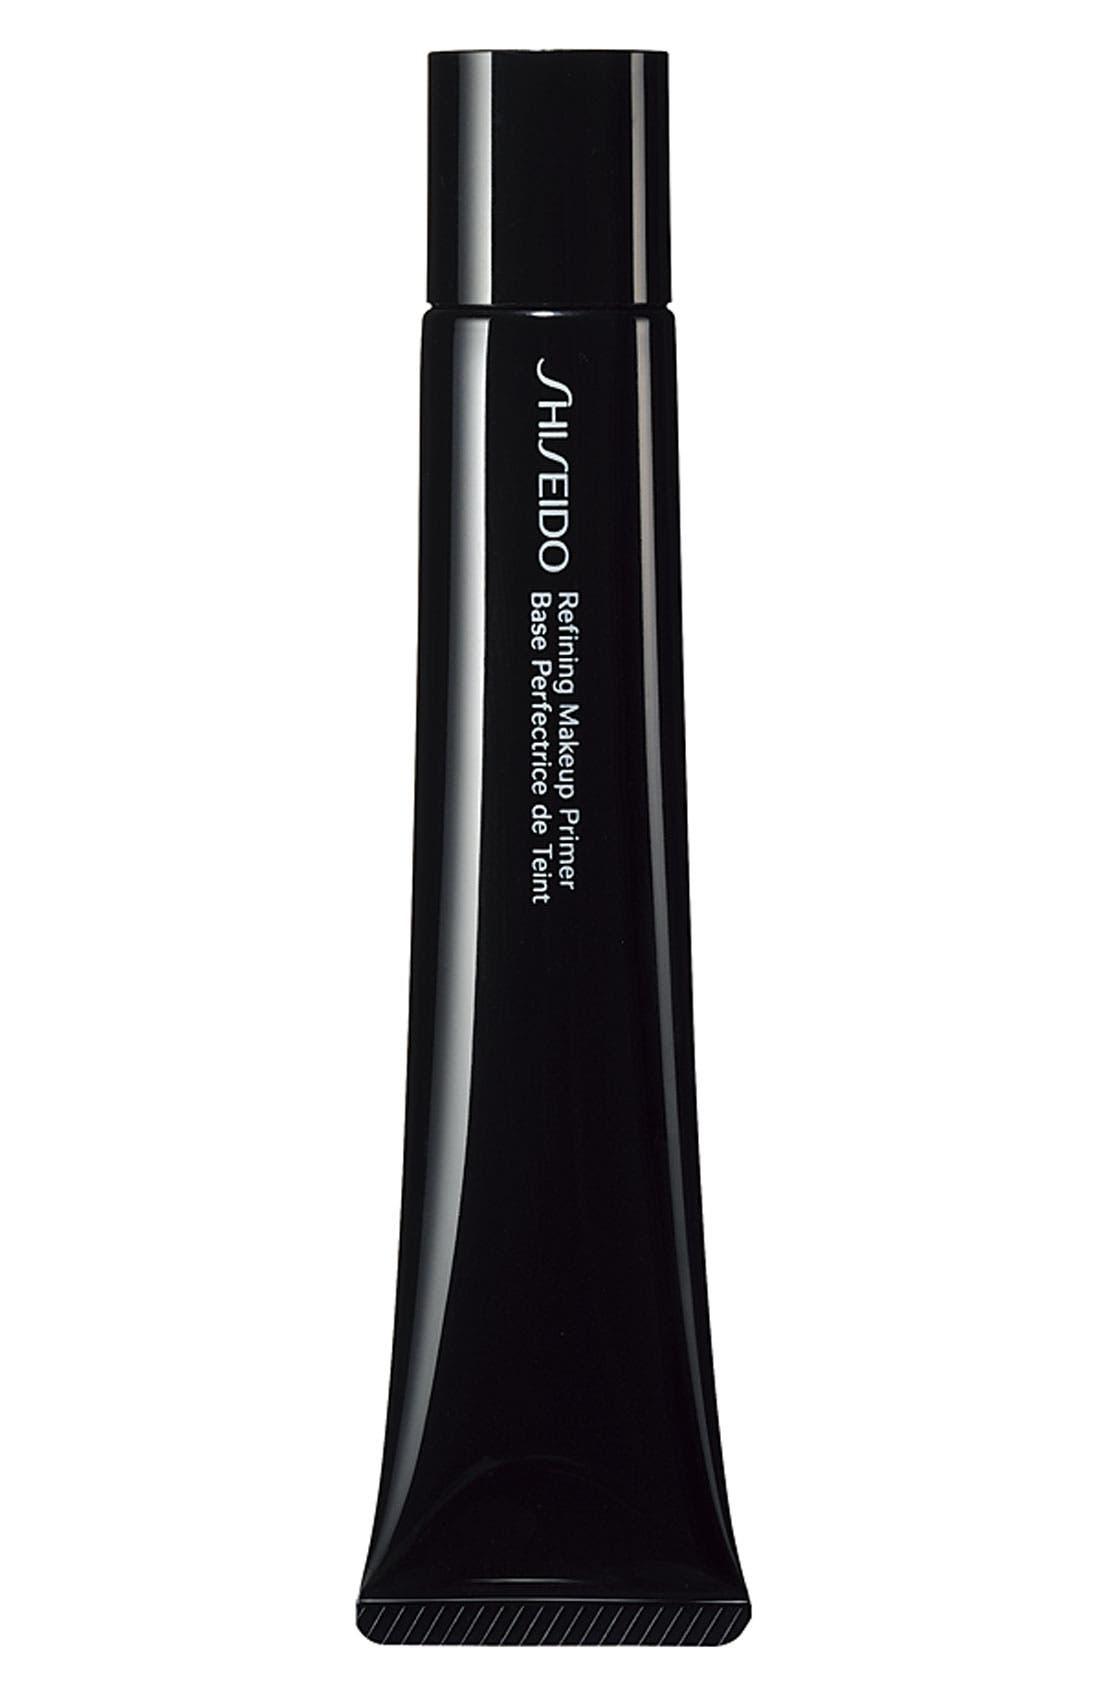 Shiseido 'The Makeup' Refining Makeup Primer SPF 20